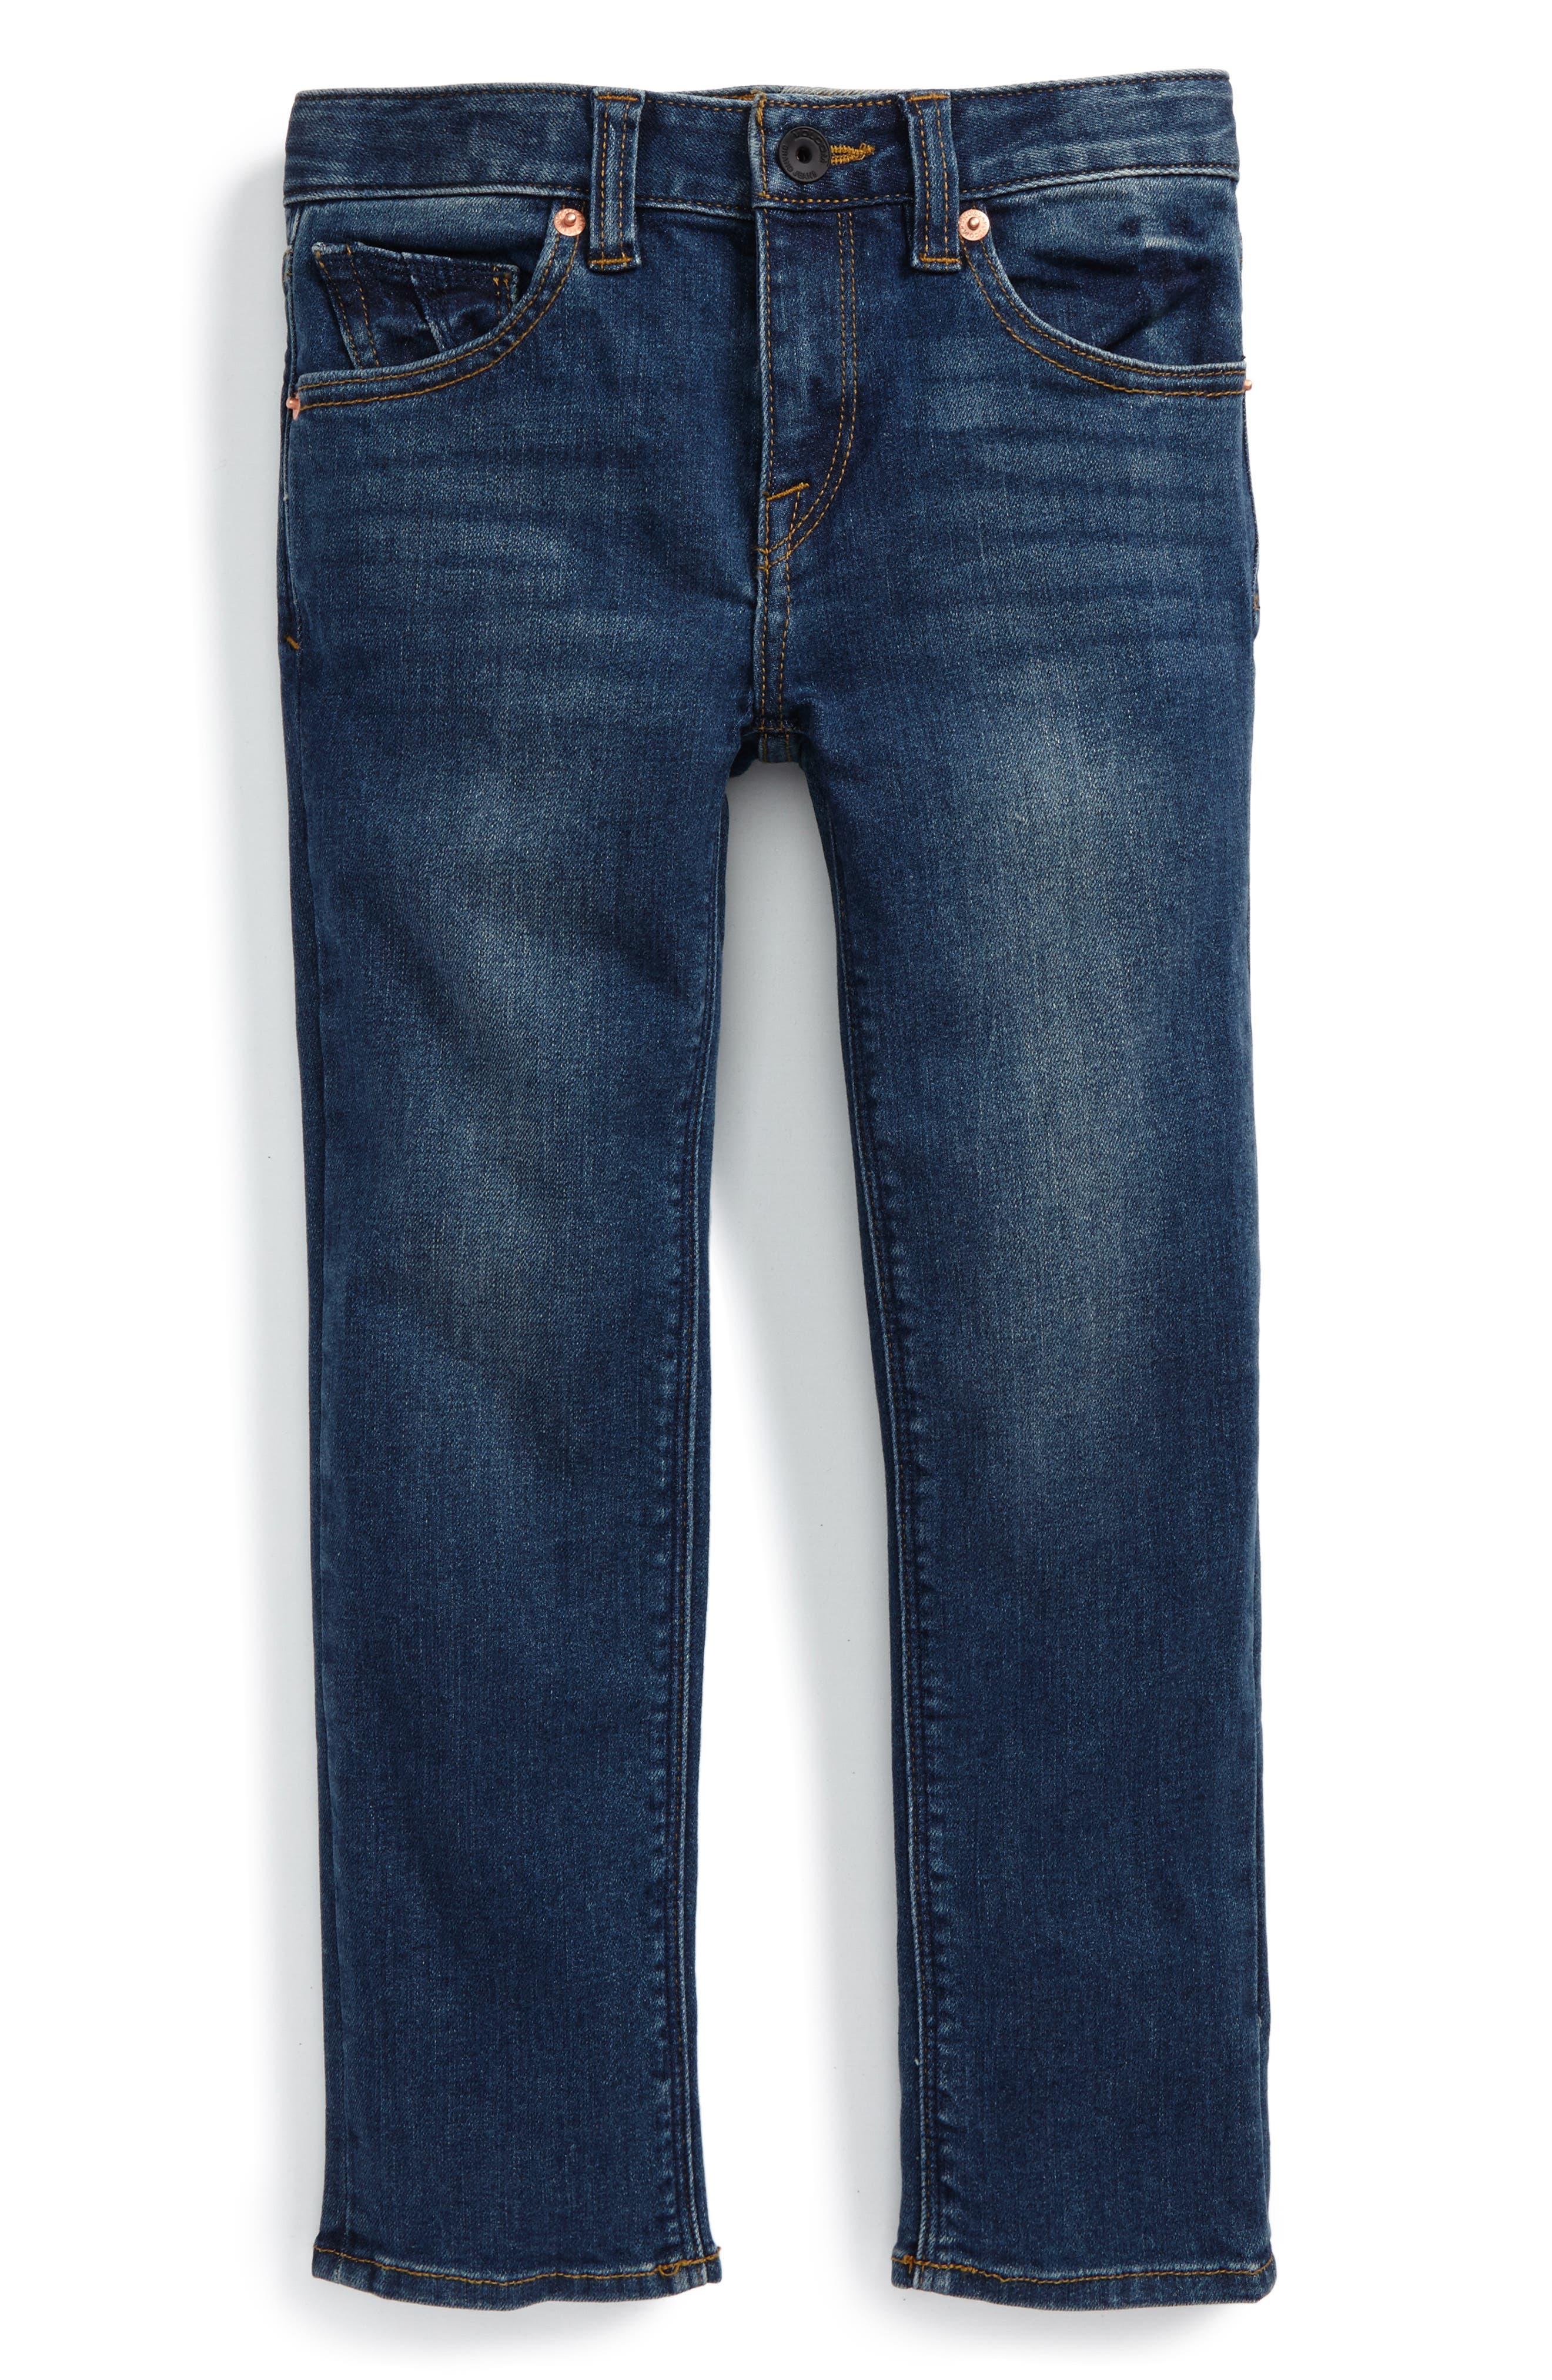 'Vorta' Slim Fit Jeans,                         Main,                         color, Dust Bowl Indigo